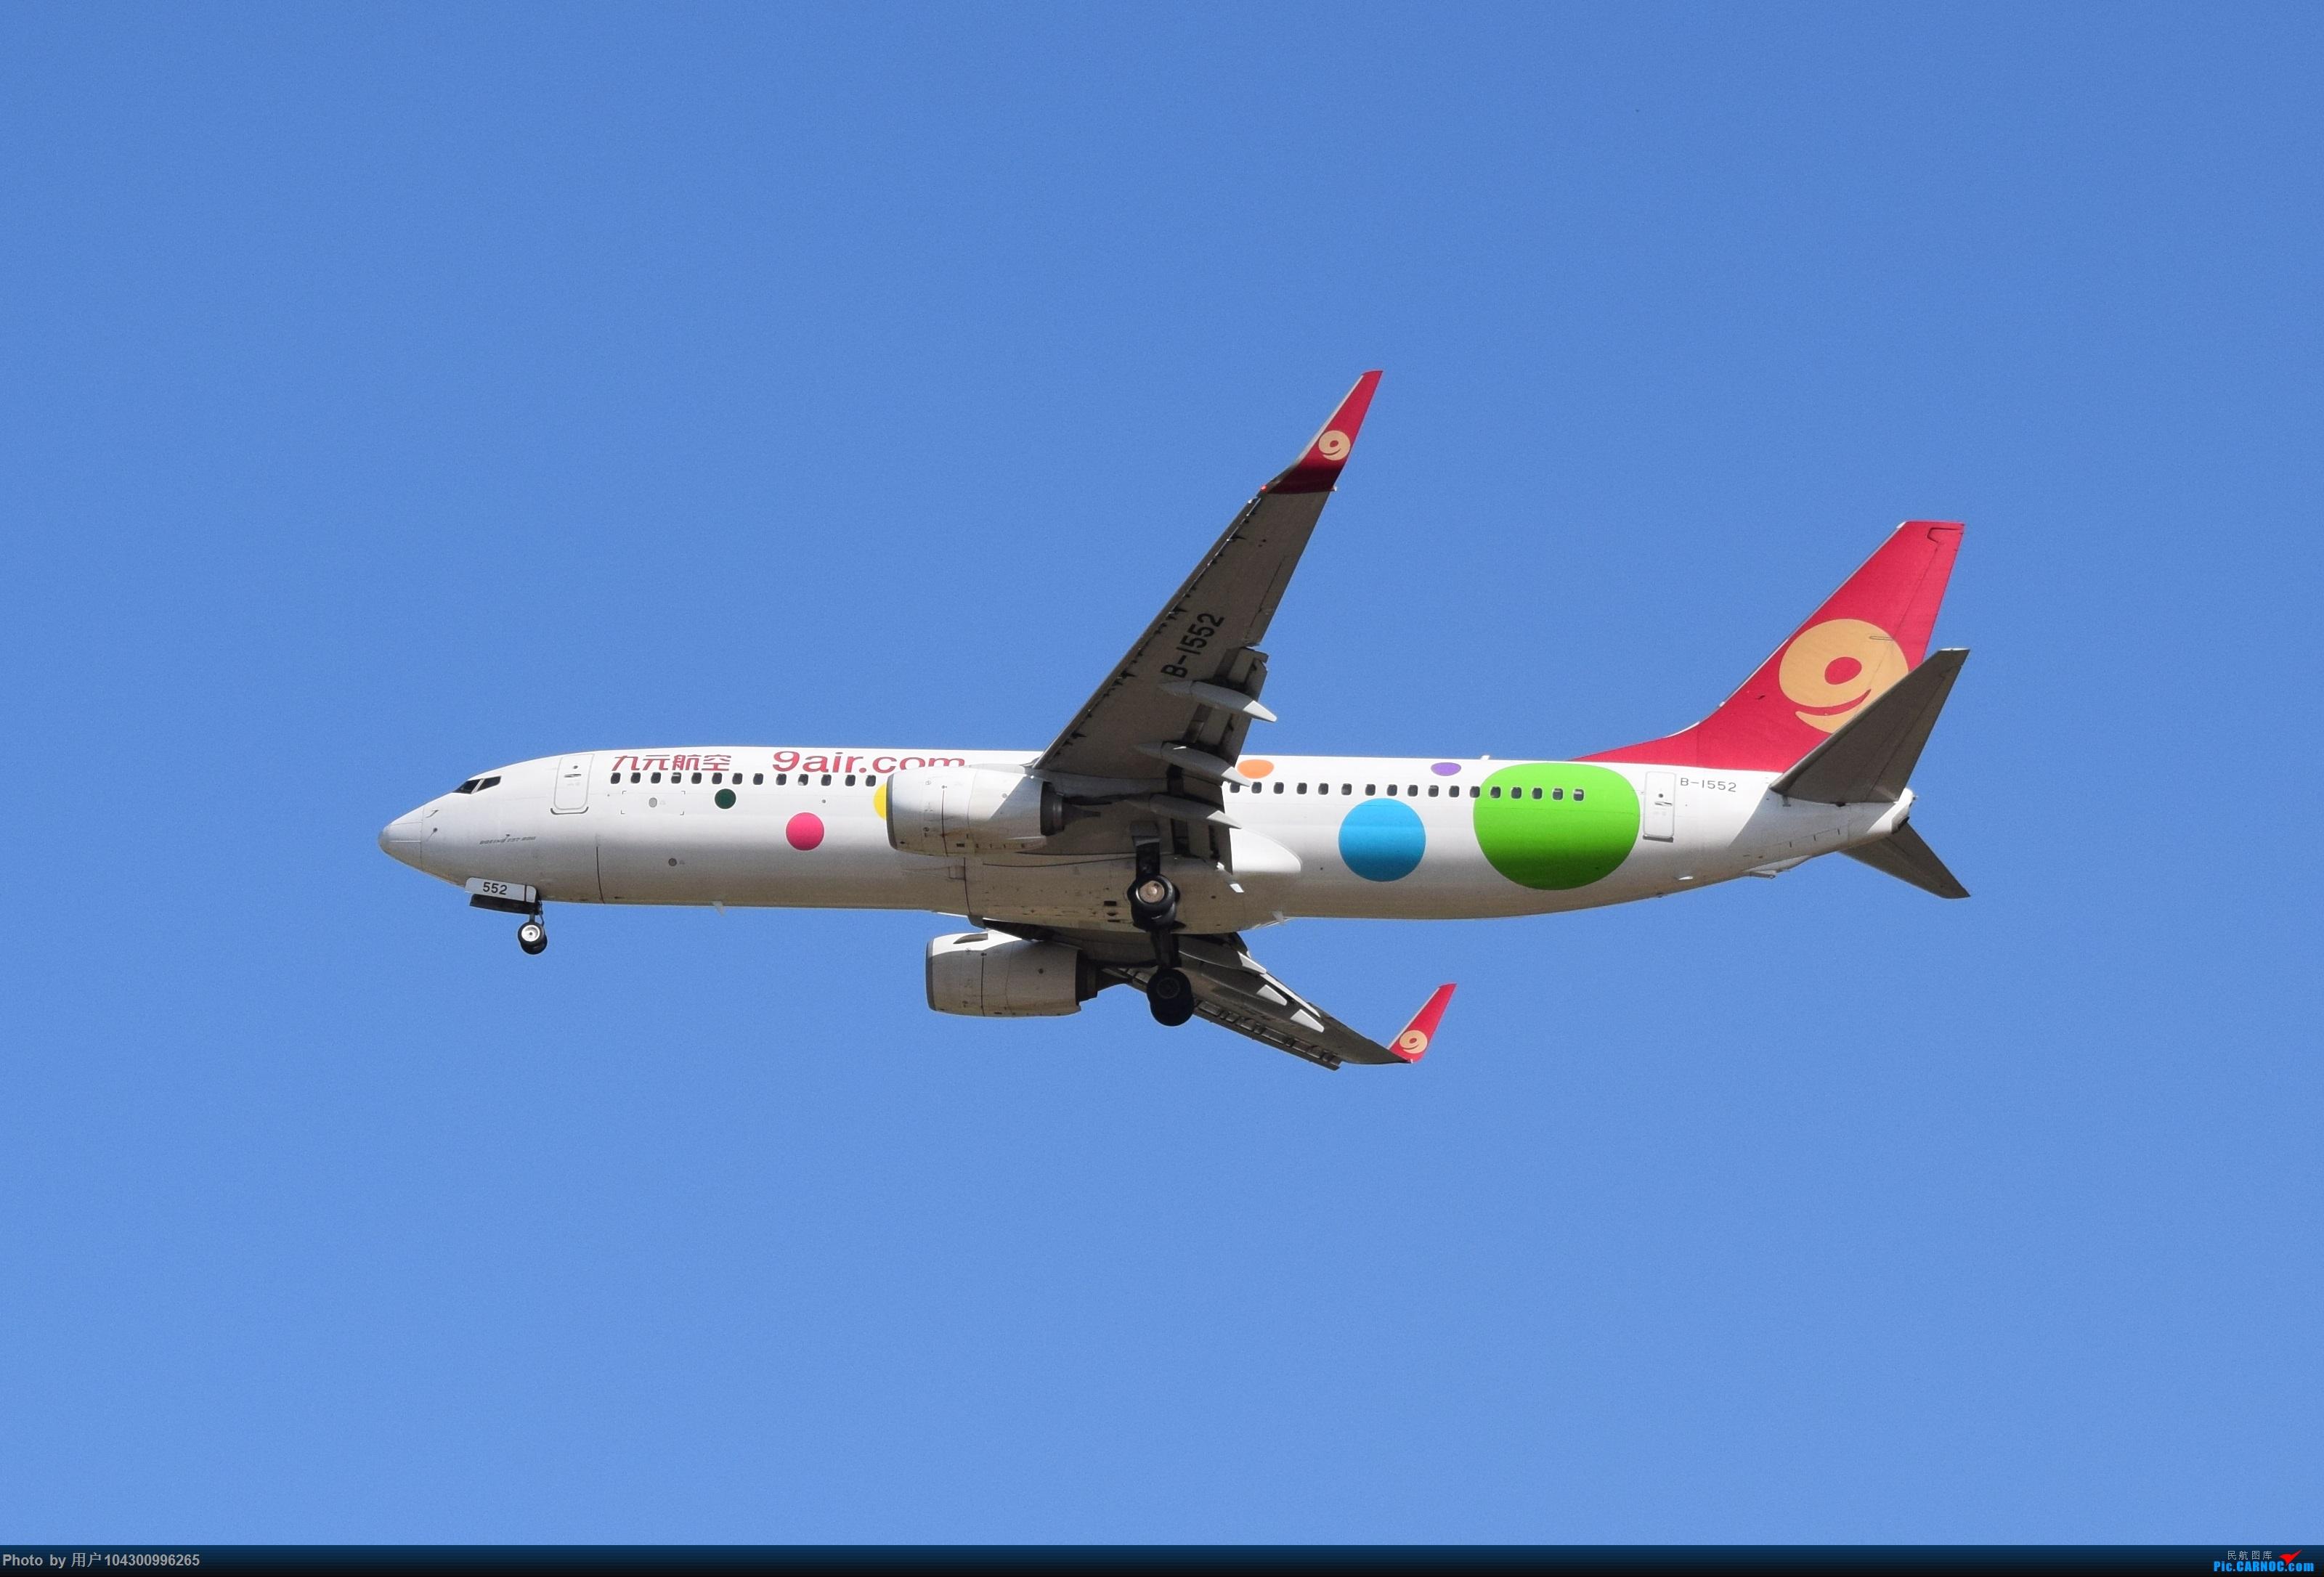 Re:[原创][KWE]贵阳今天天气不错,随便拍几张! BOEING 737-800 B-1552 中国贵阳龙洞堡国际机场